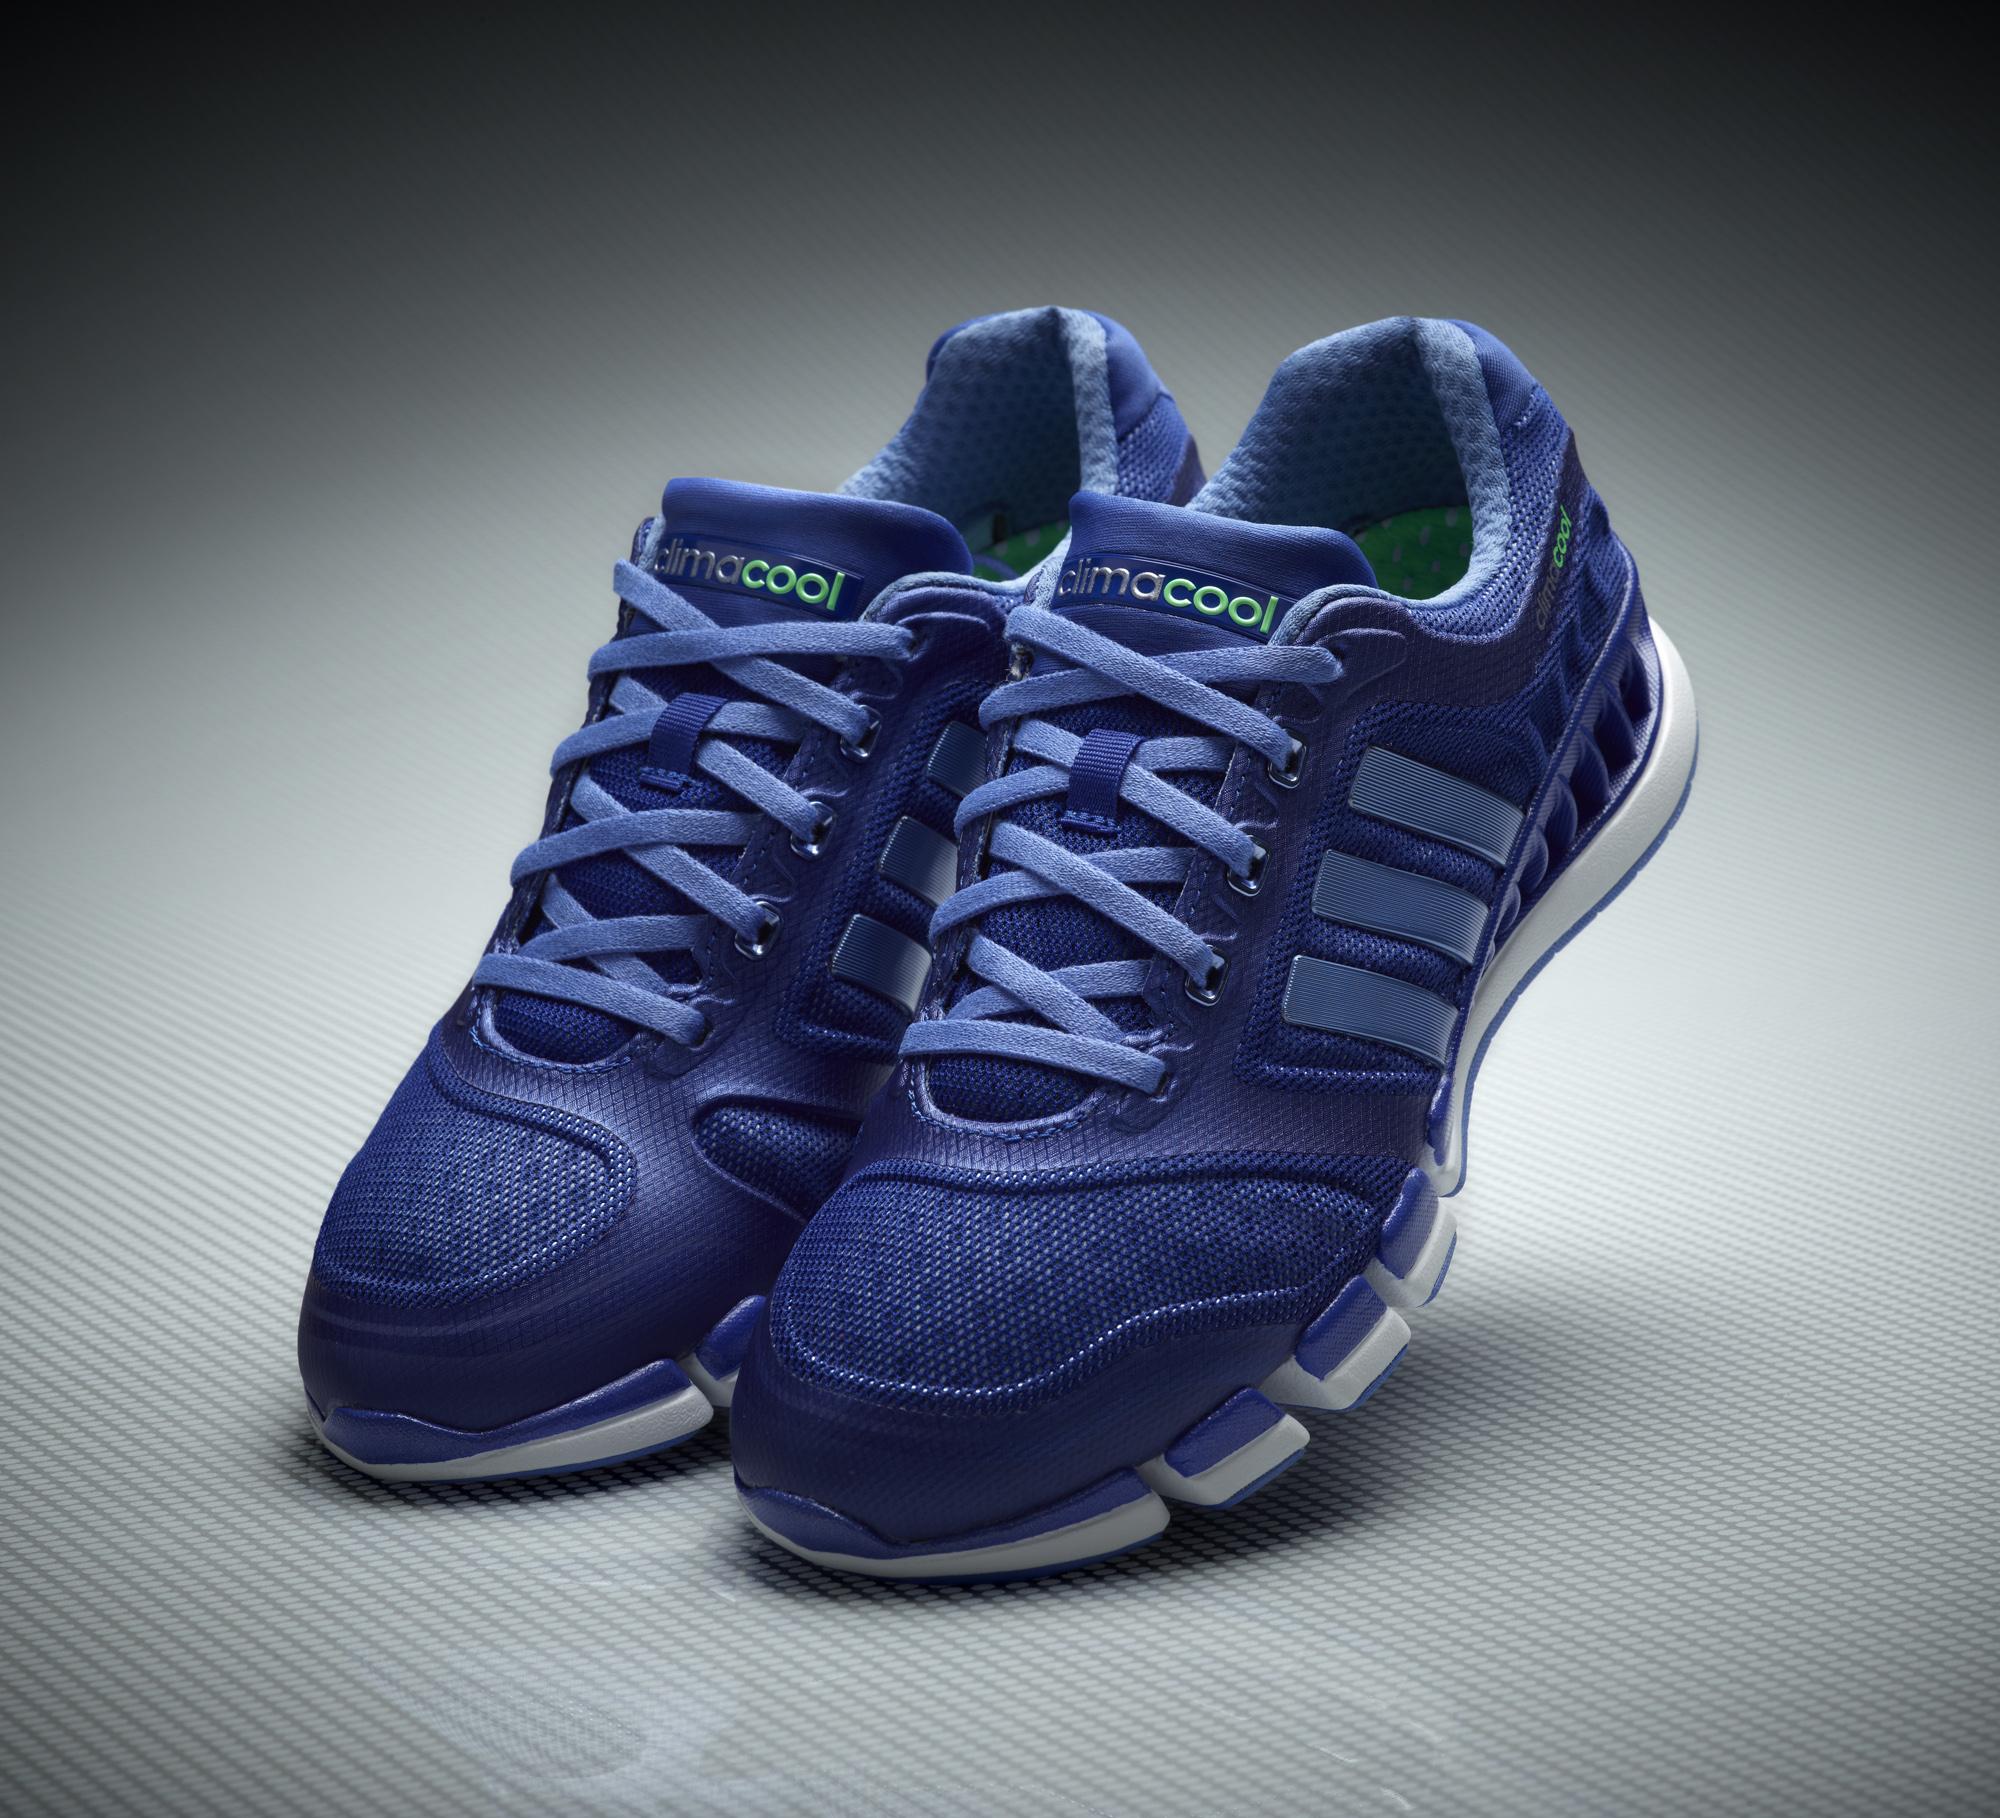 Adidas Climacool Revolution 2013 Pinoy Fitness